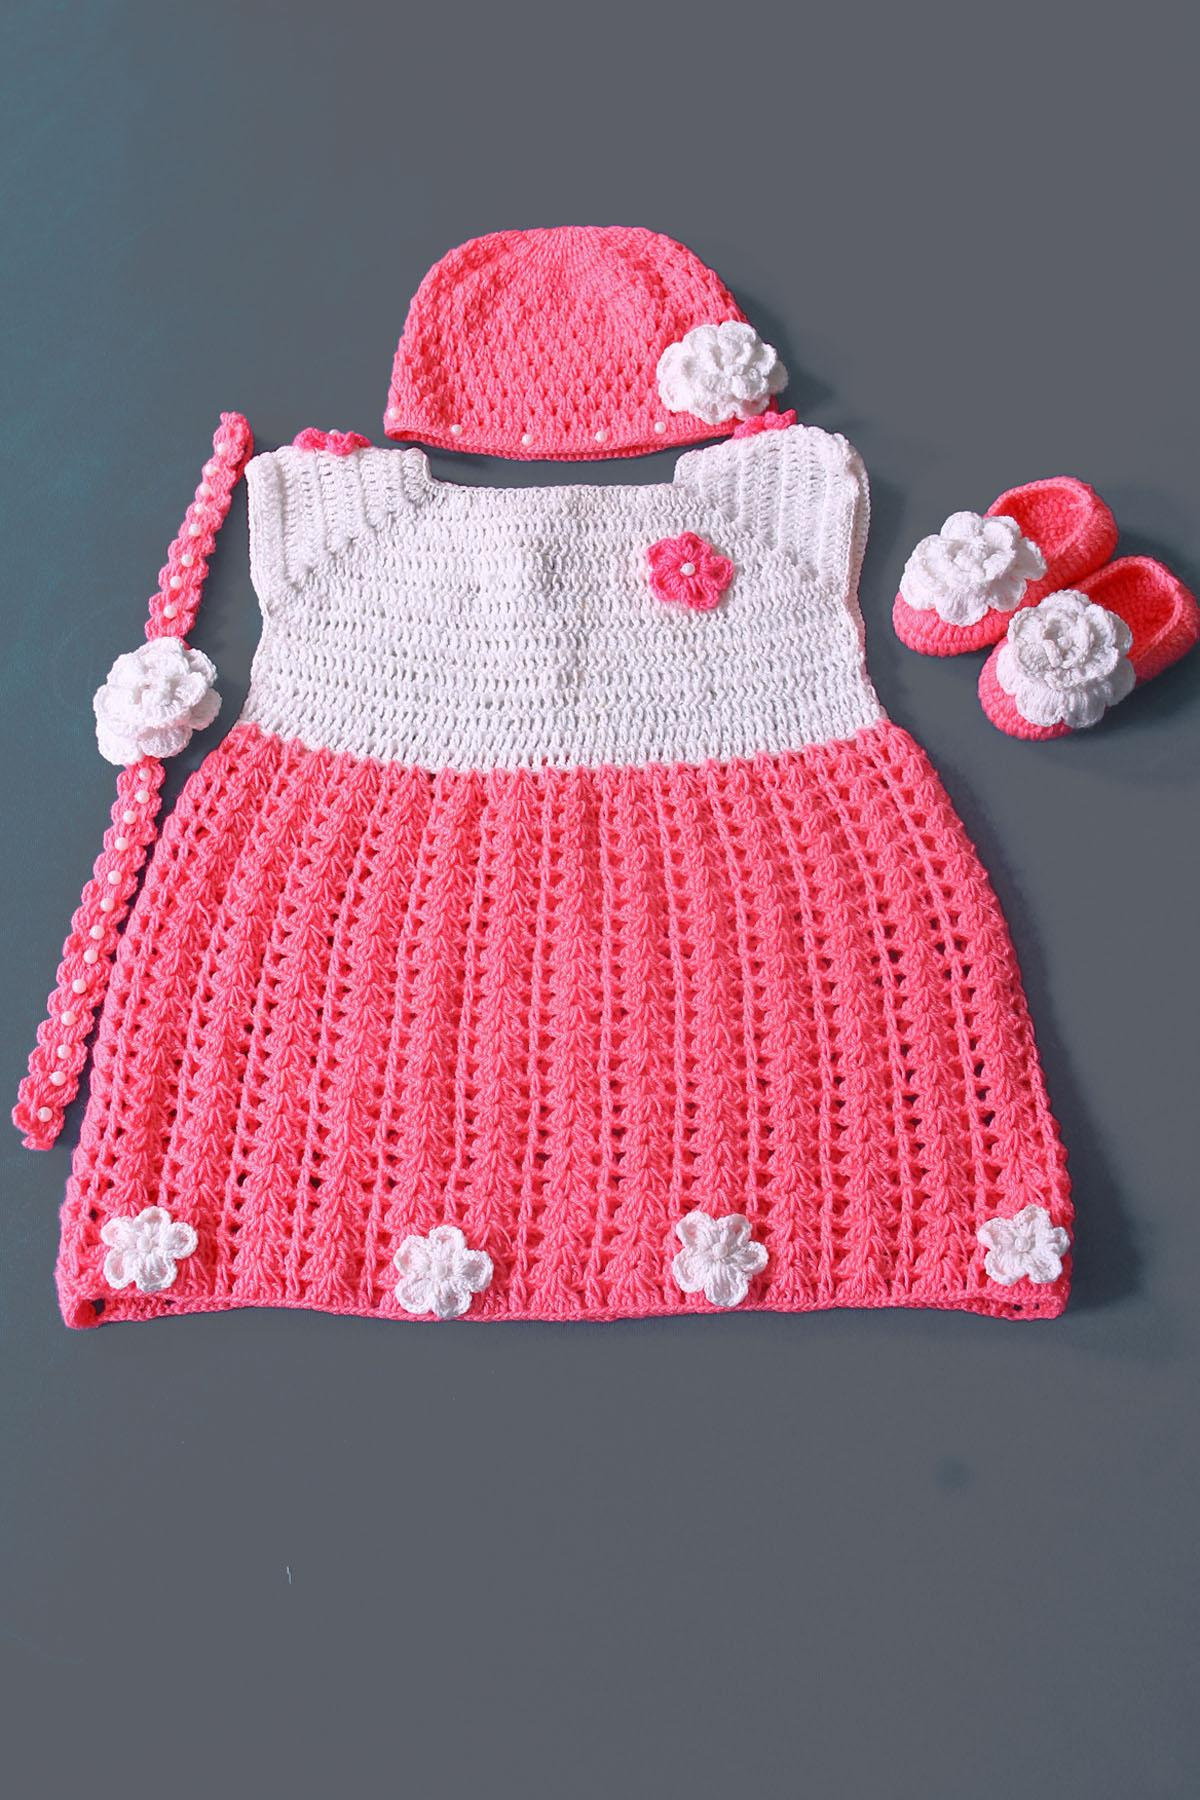 8ead2d2bb700 Crochet Baby Dress Online Pakistan